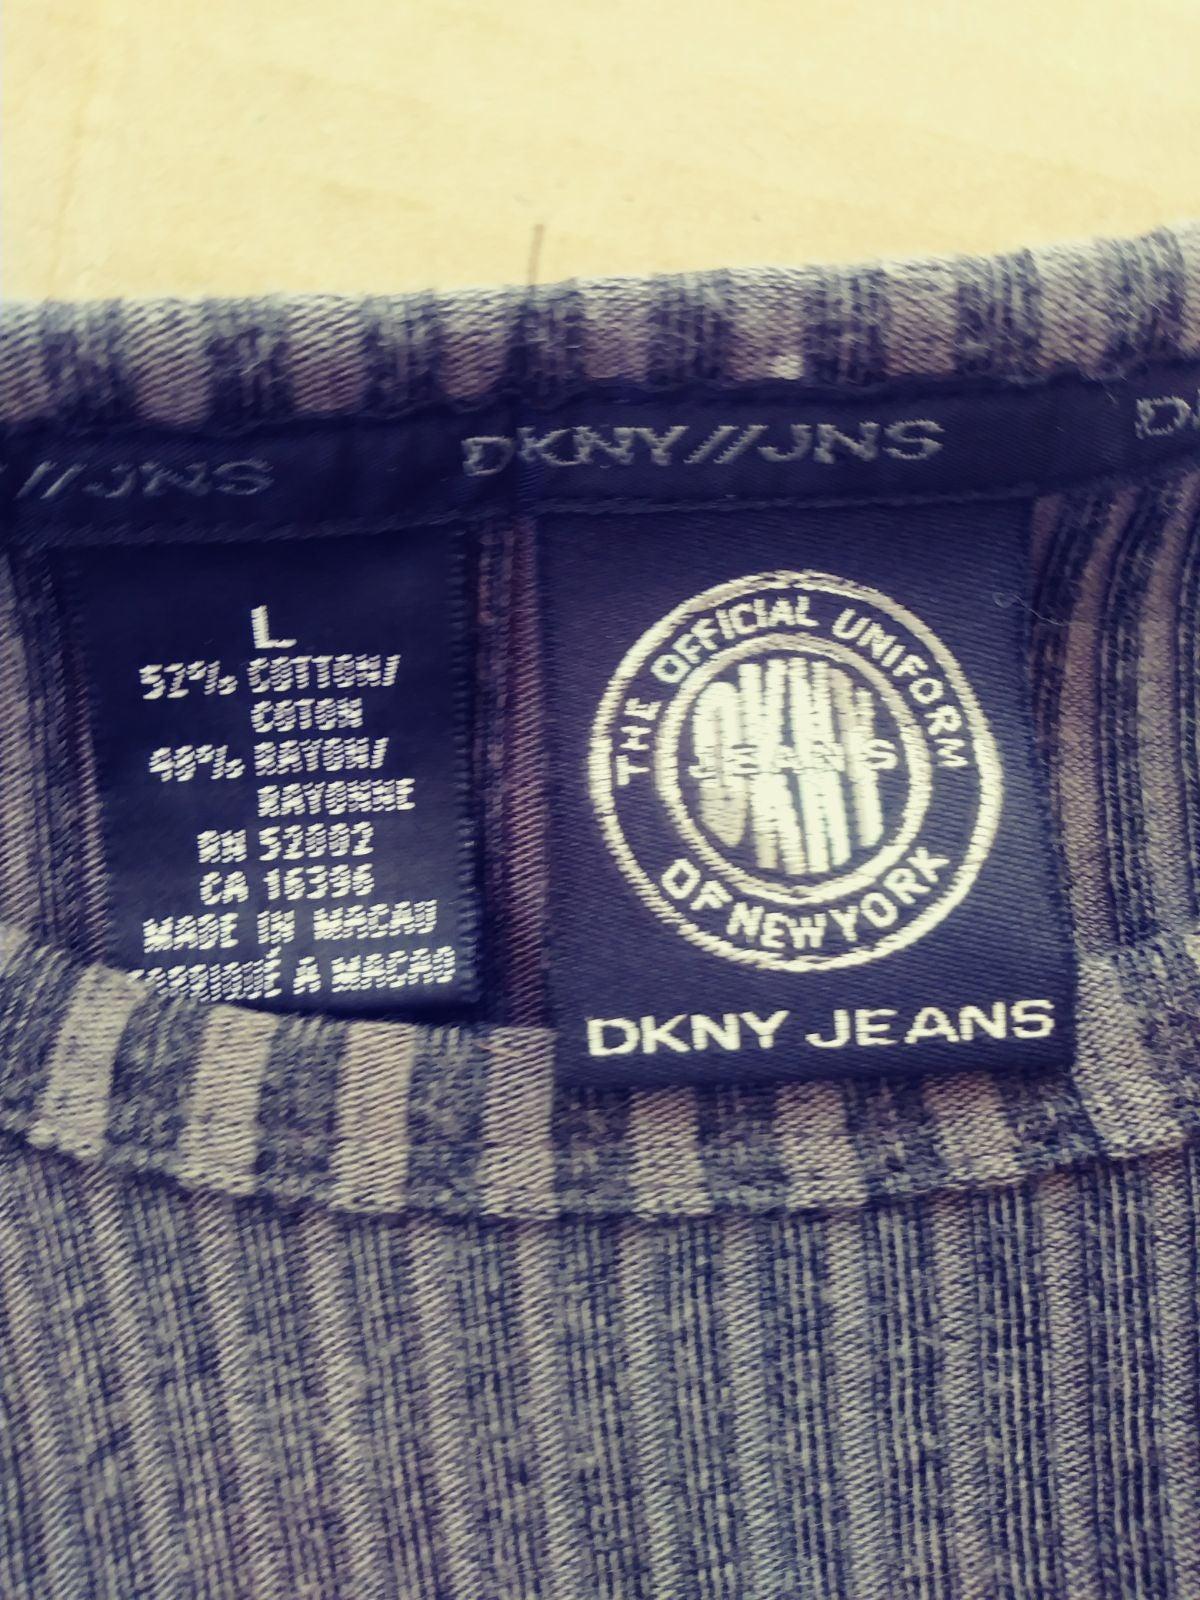 DKNY Top!